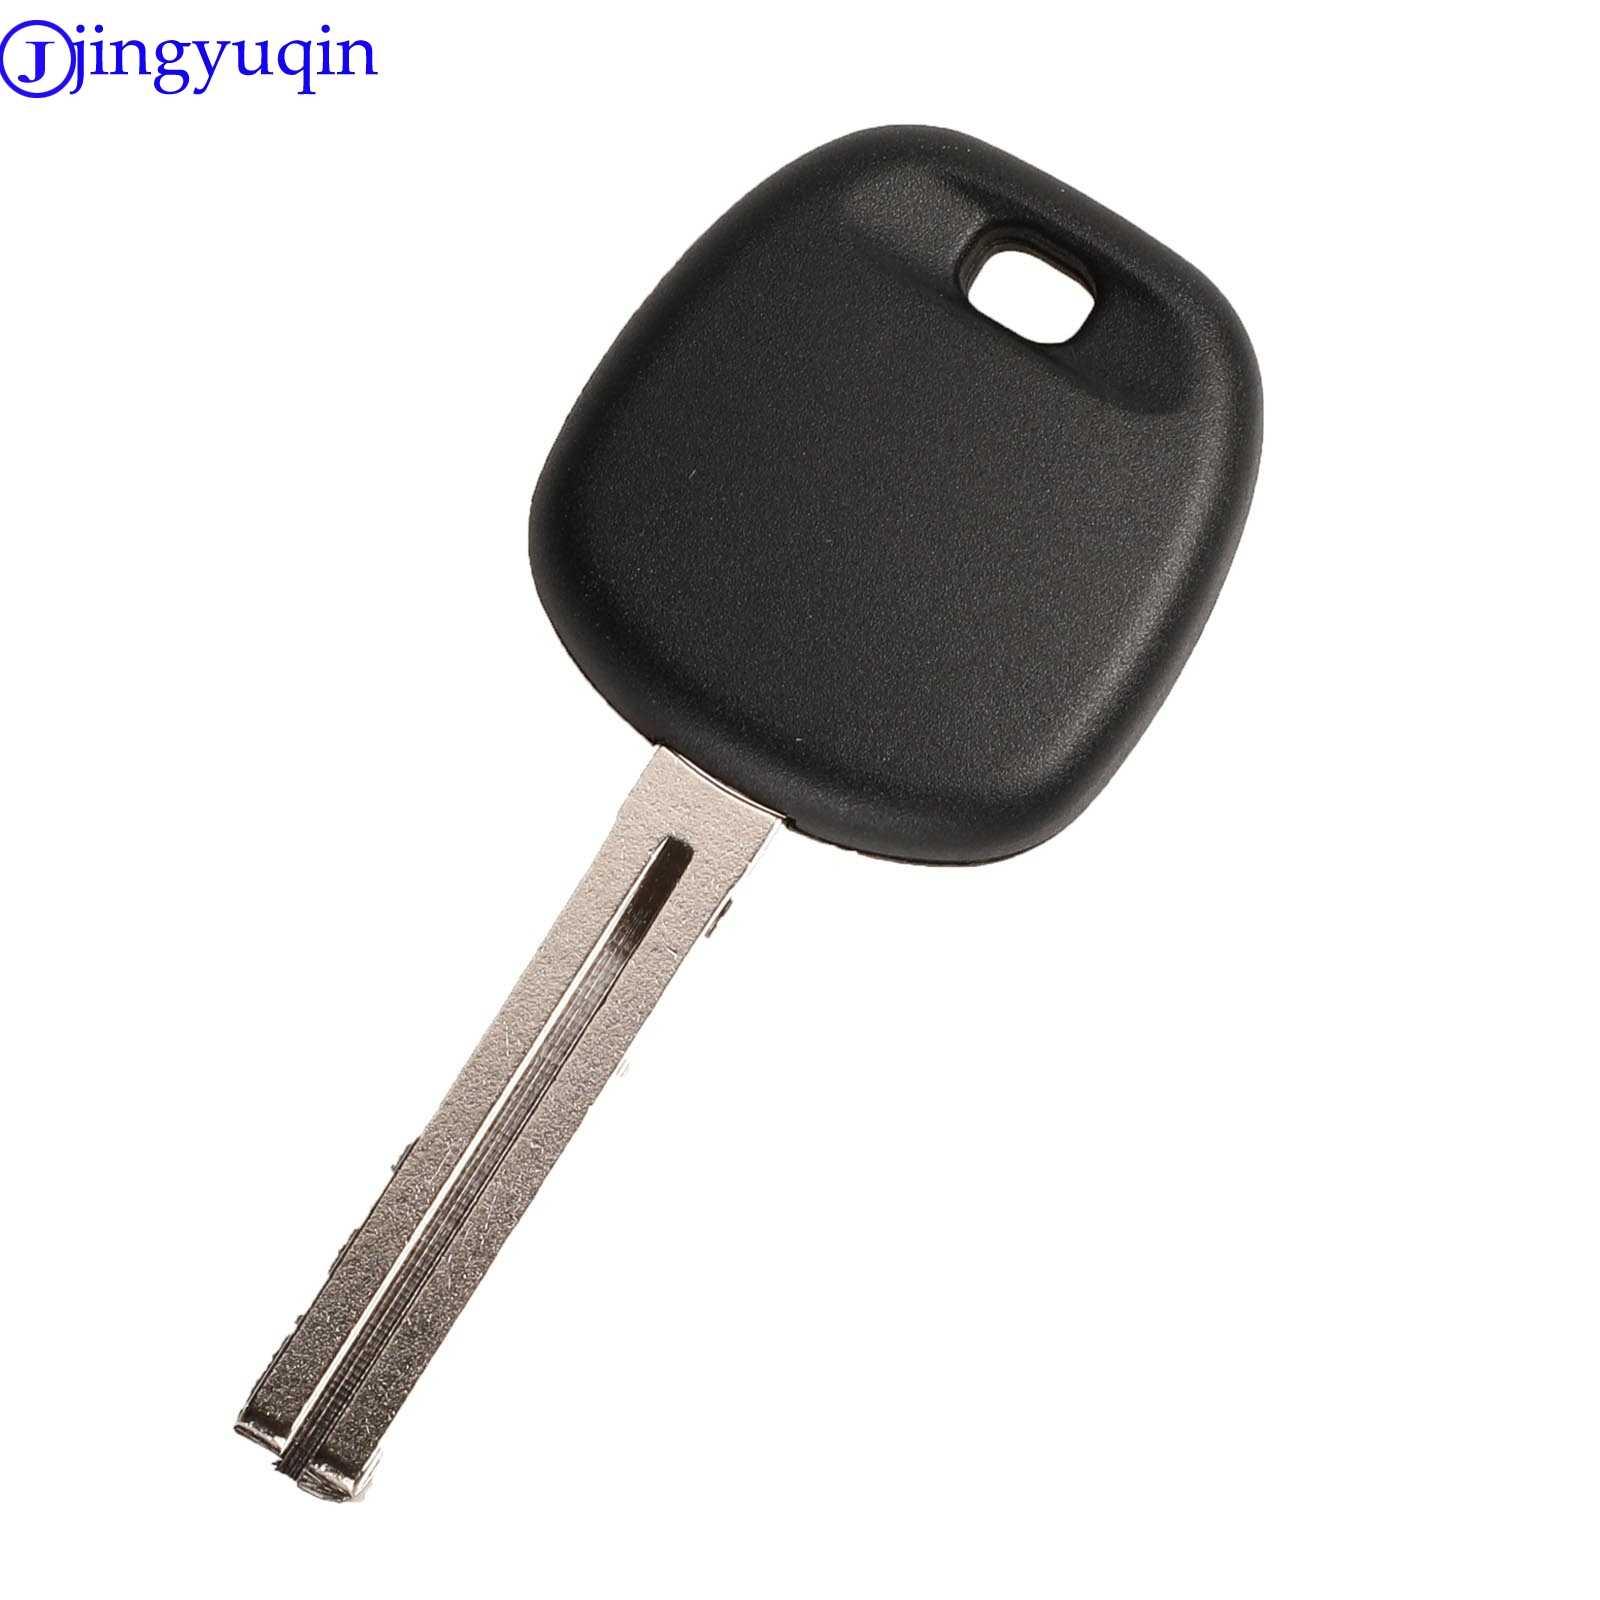 Jingyuqin Transponder sleutel voor Toyota Vervanging Afstandsbediening Autosleutel Shell Case Fob Met 4D67 Chip Ongesneden TOY43 Blade